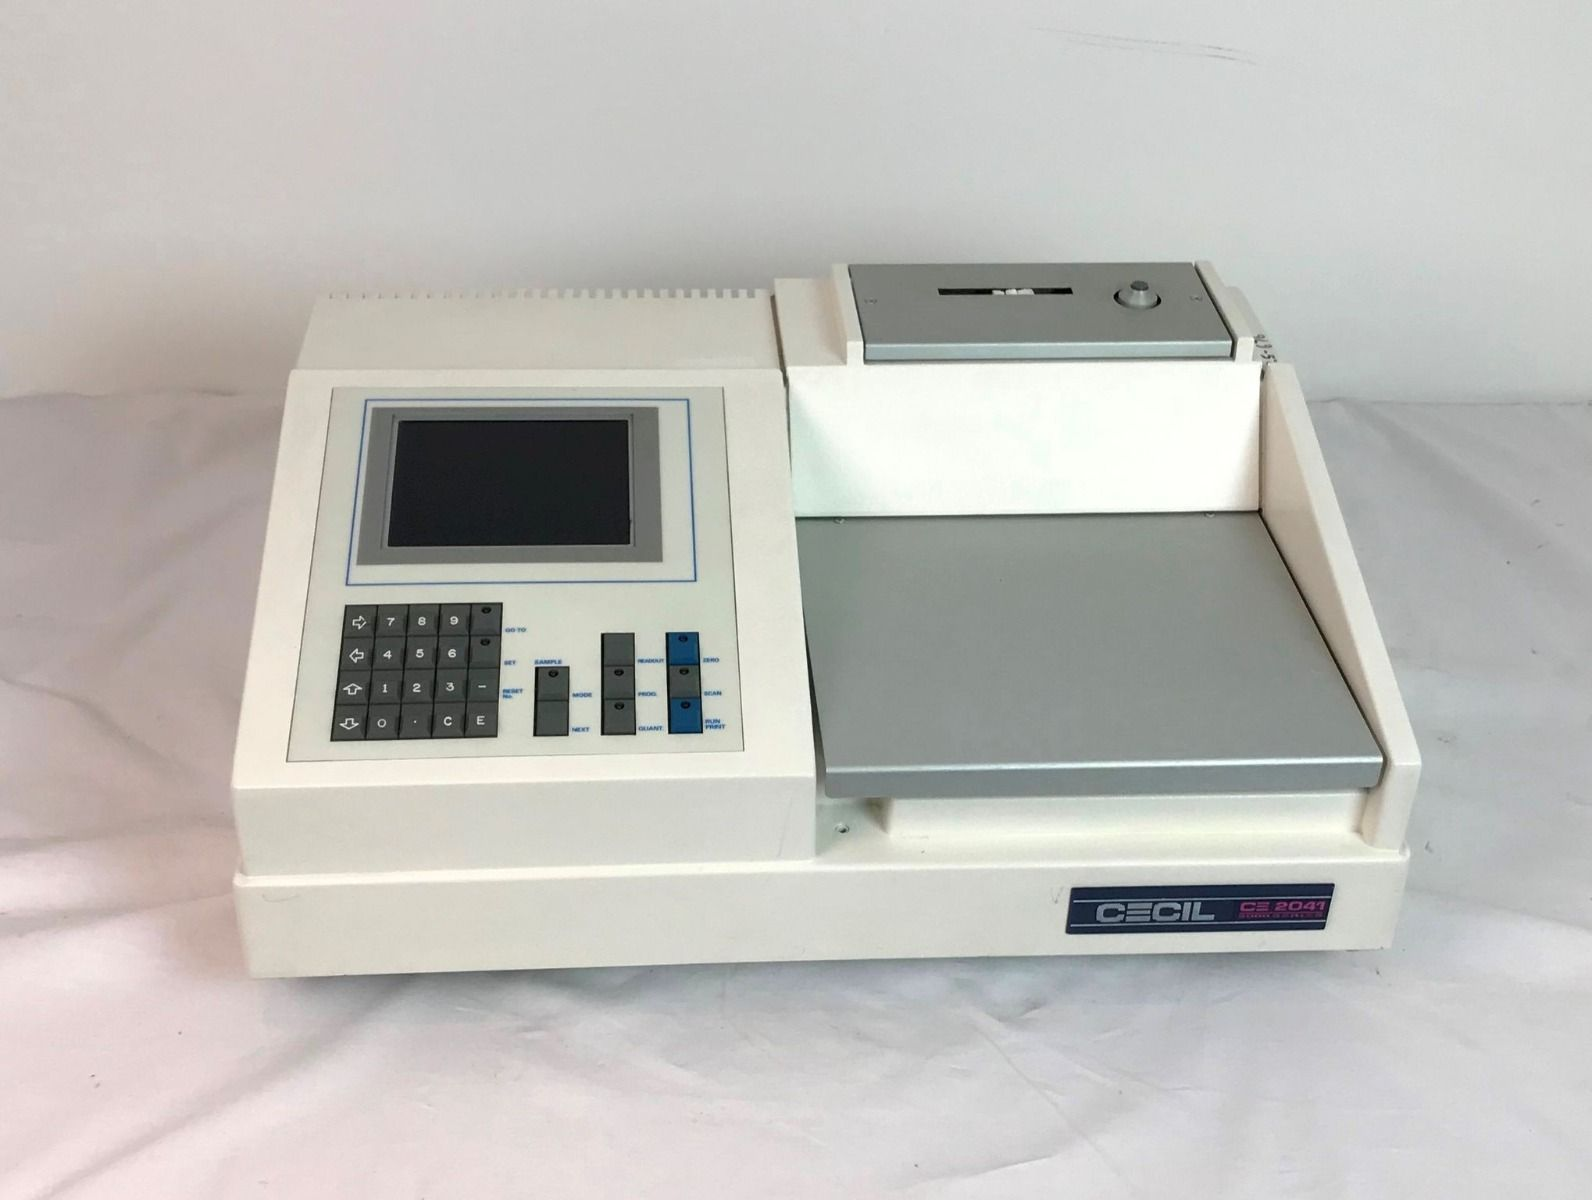 Cecil CE2041 UV/Vis Spectrophotometer